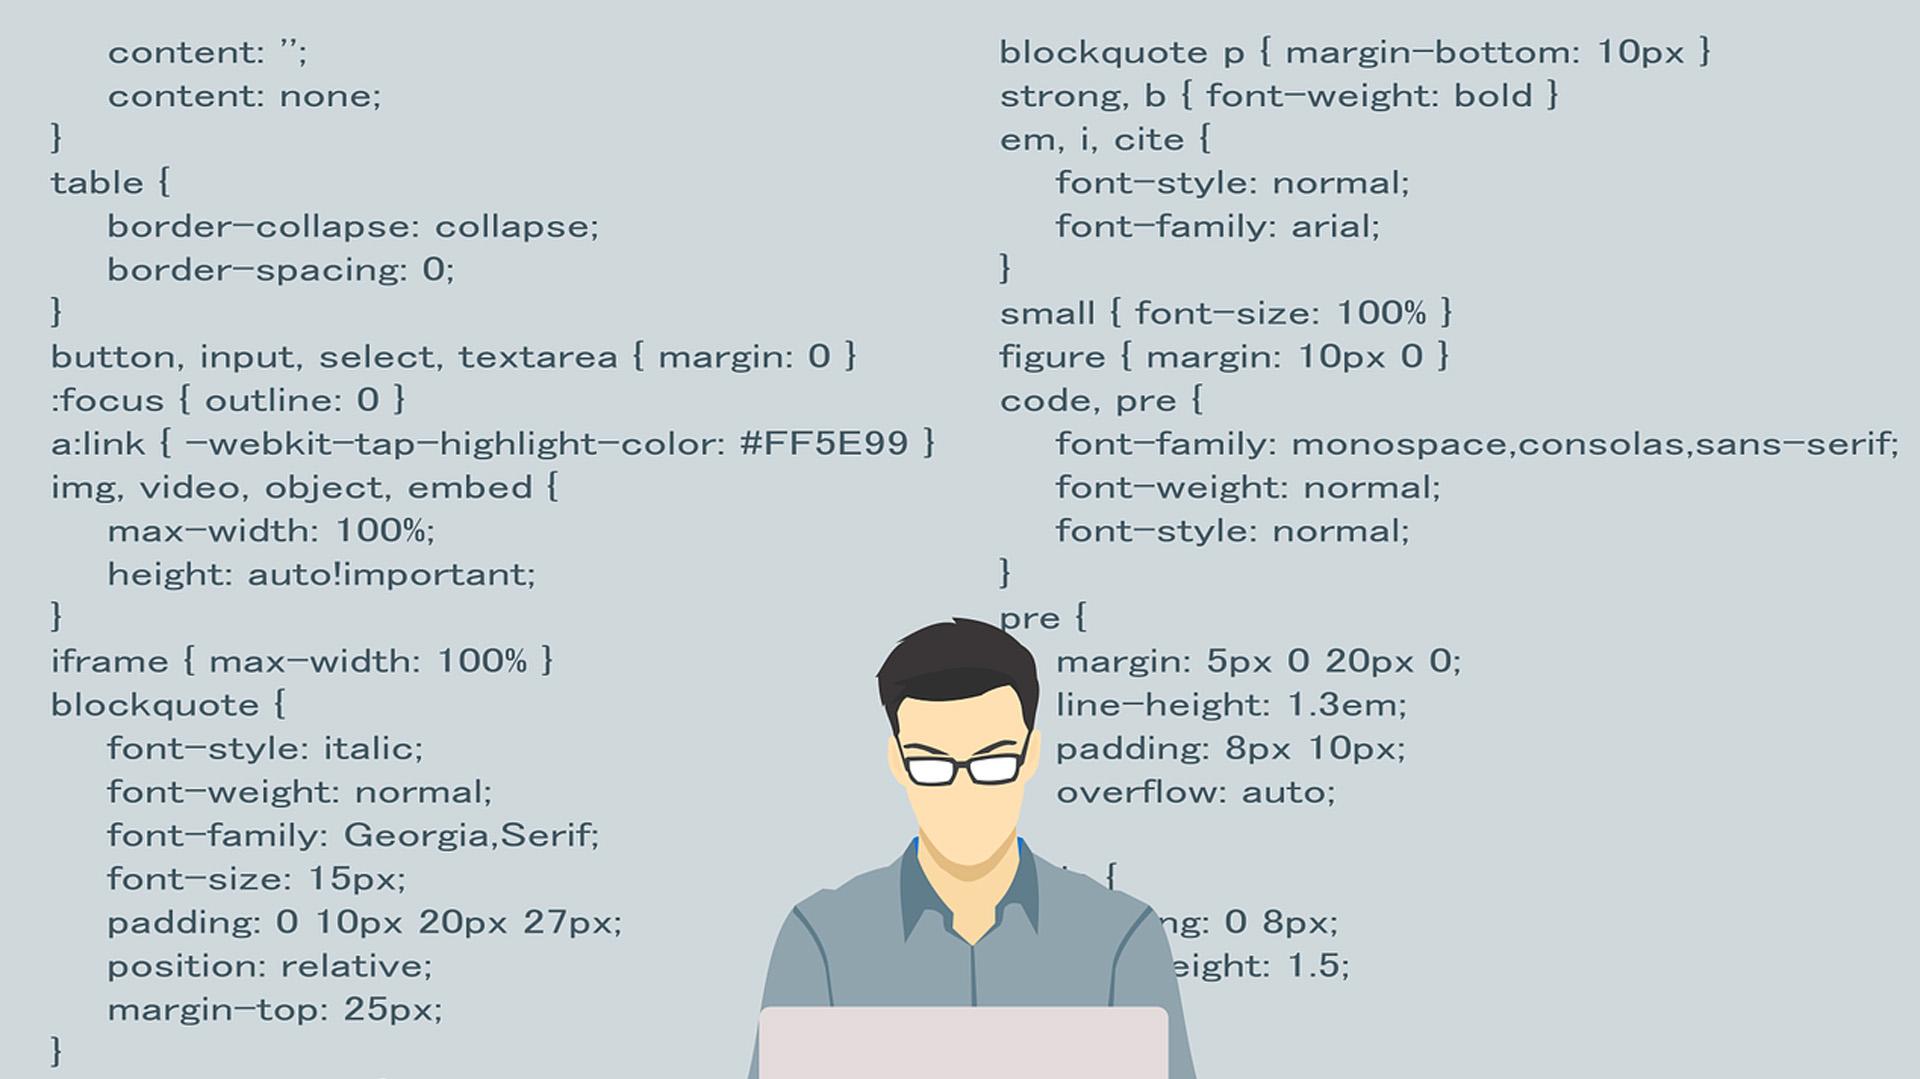 wordpress content behind illustration of man on laptop